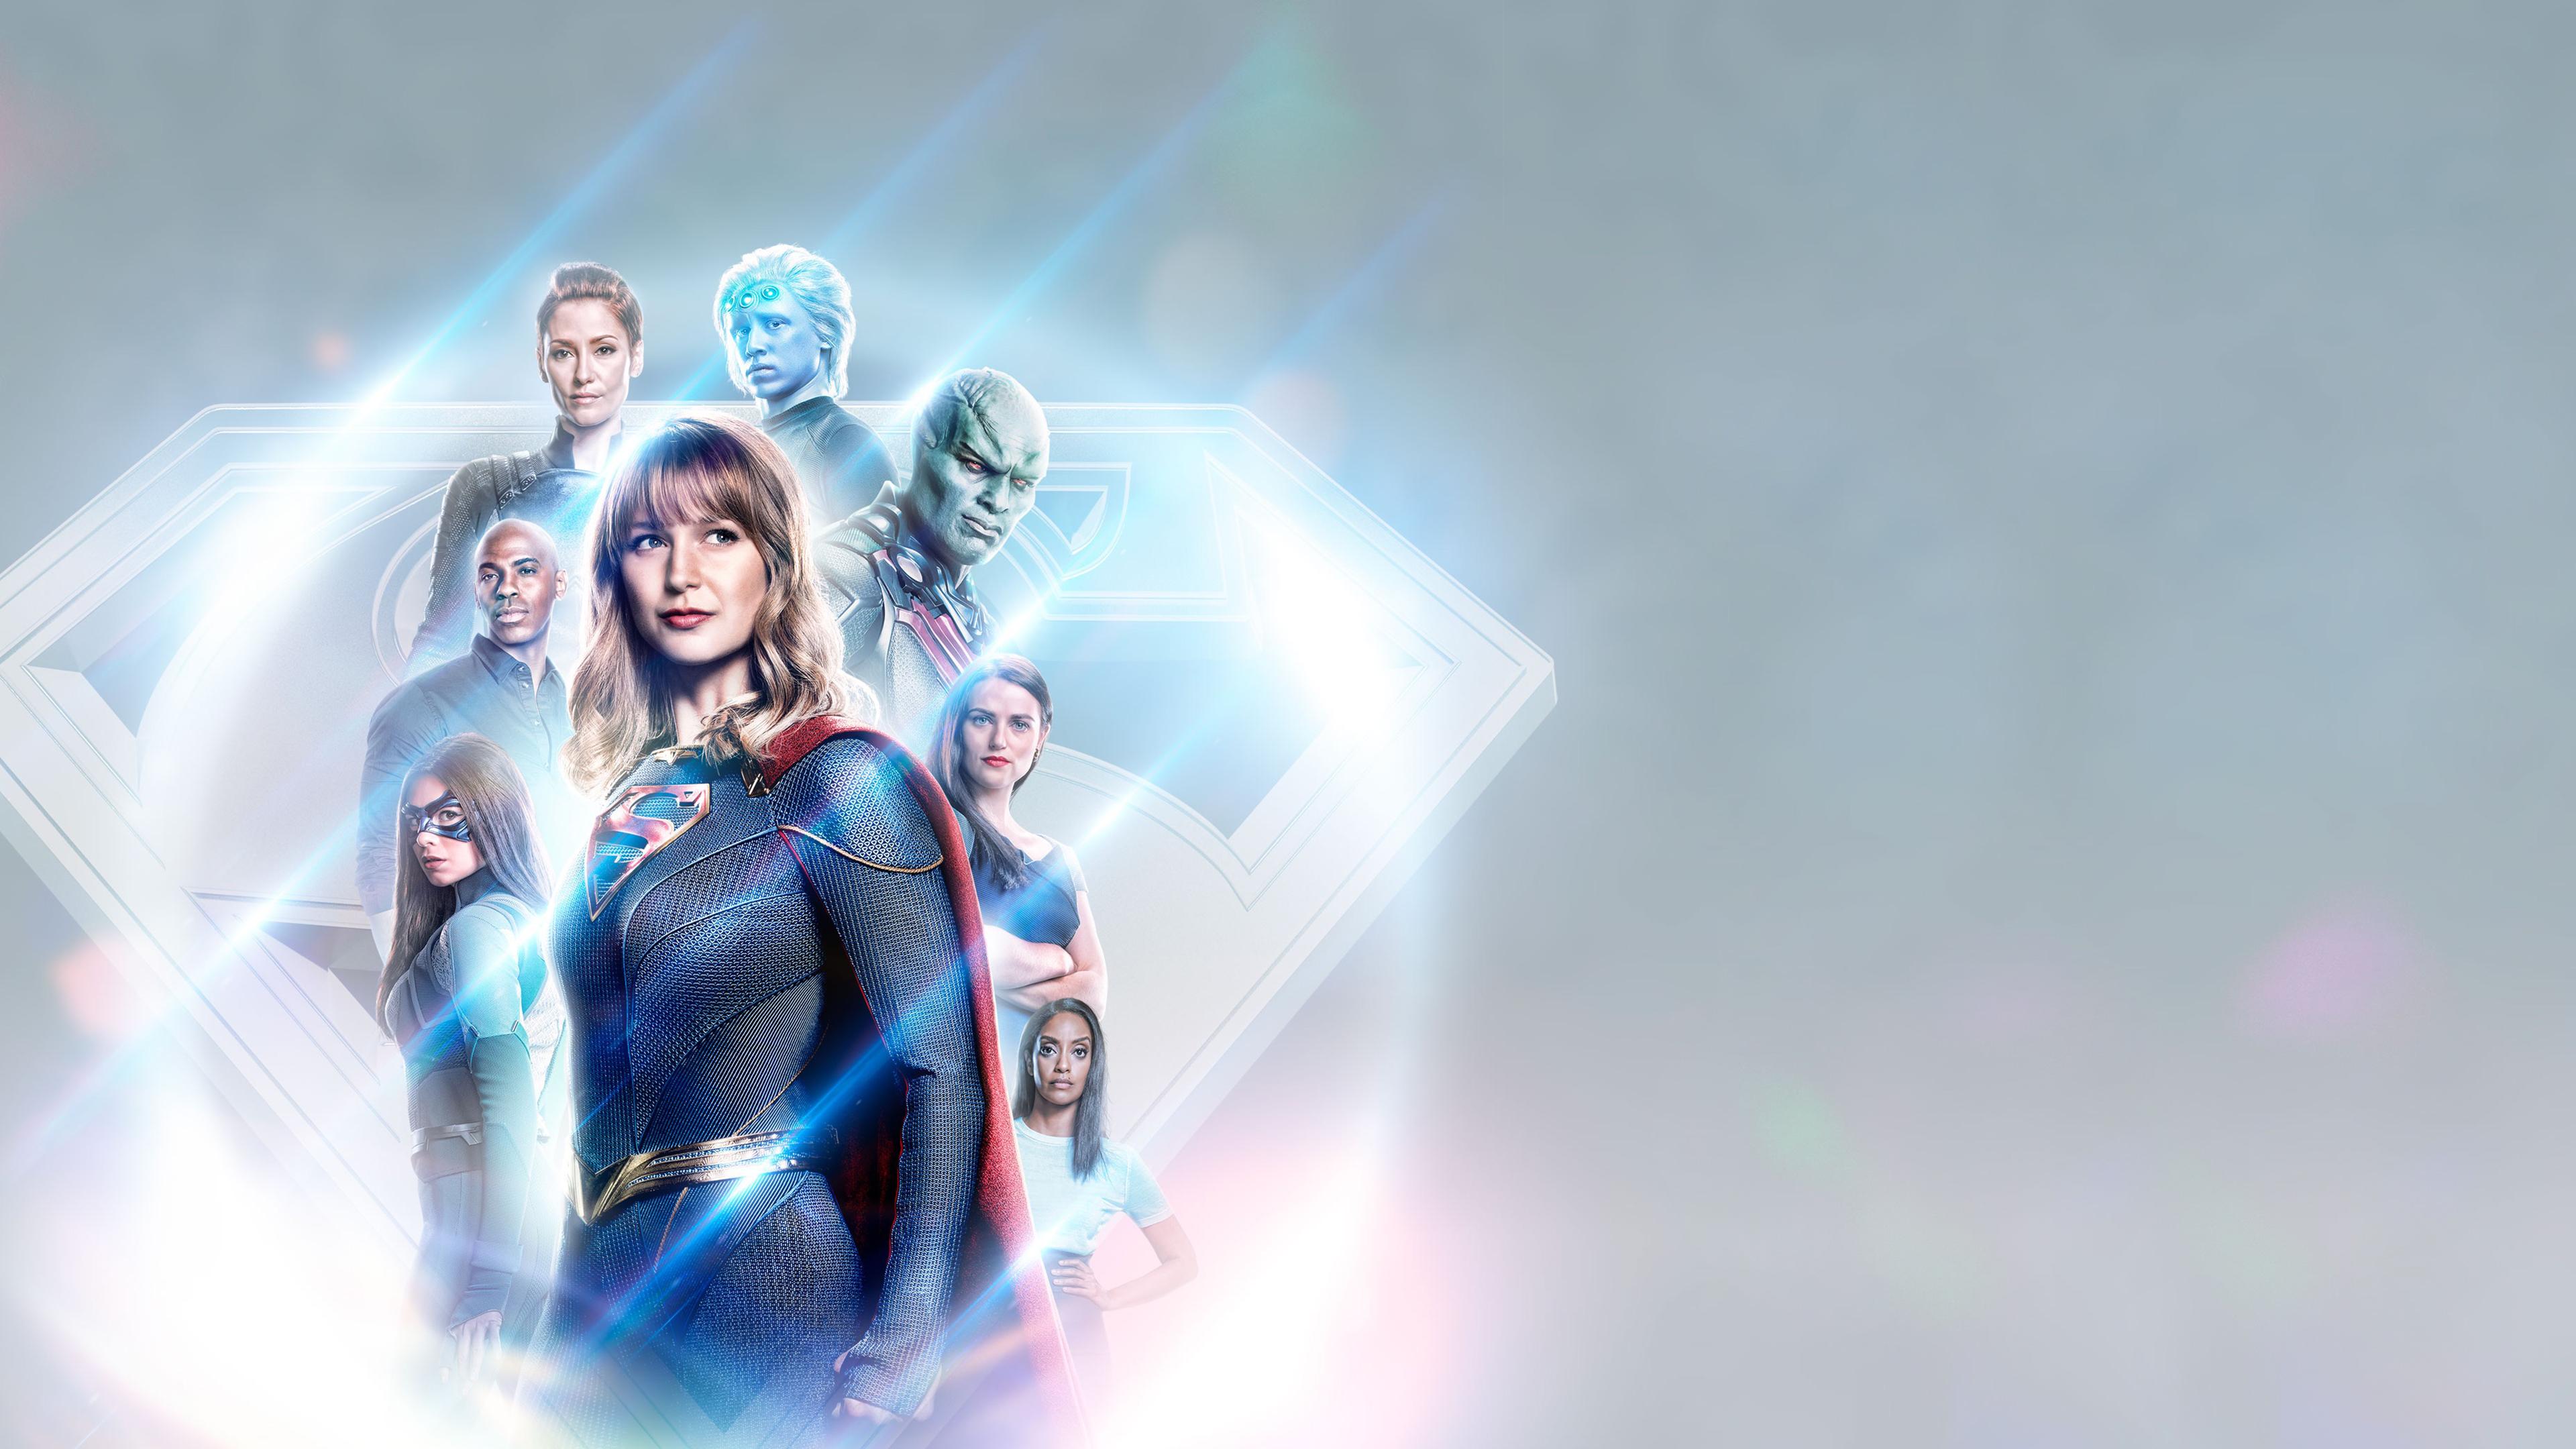 supergirl tv series 2019 1578253267 - Supergirl Tv Series 2019 - Supergirl Tv Series 2019 4k wallpaper